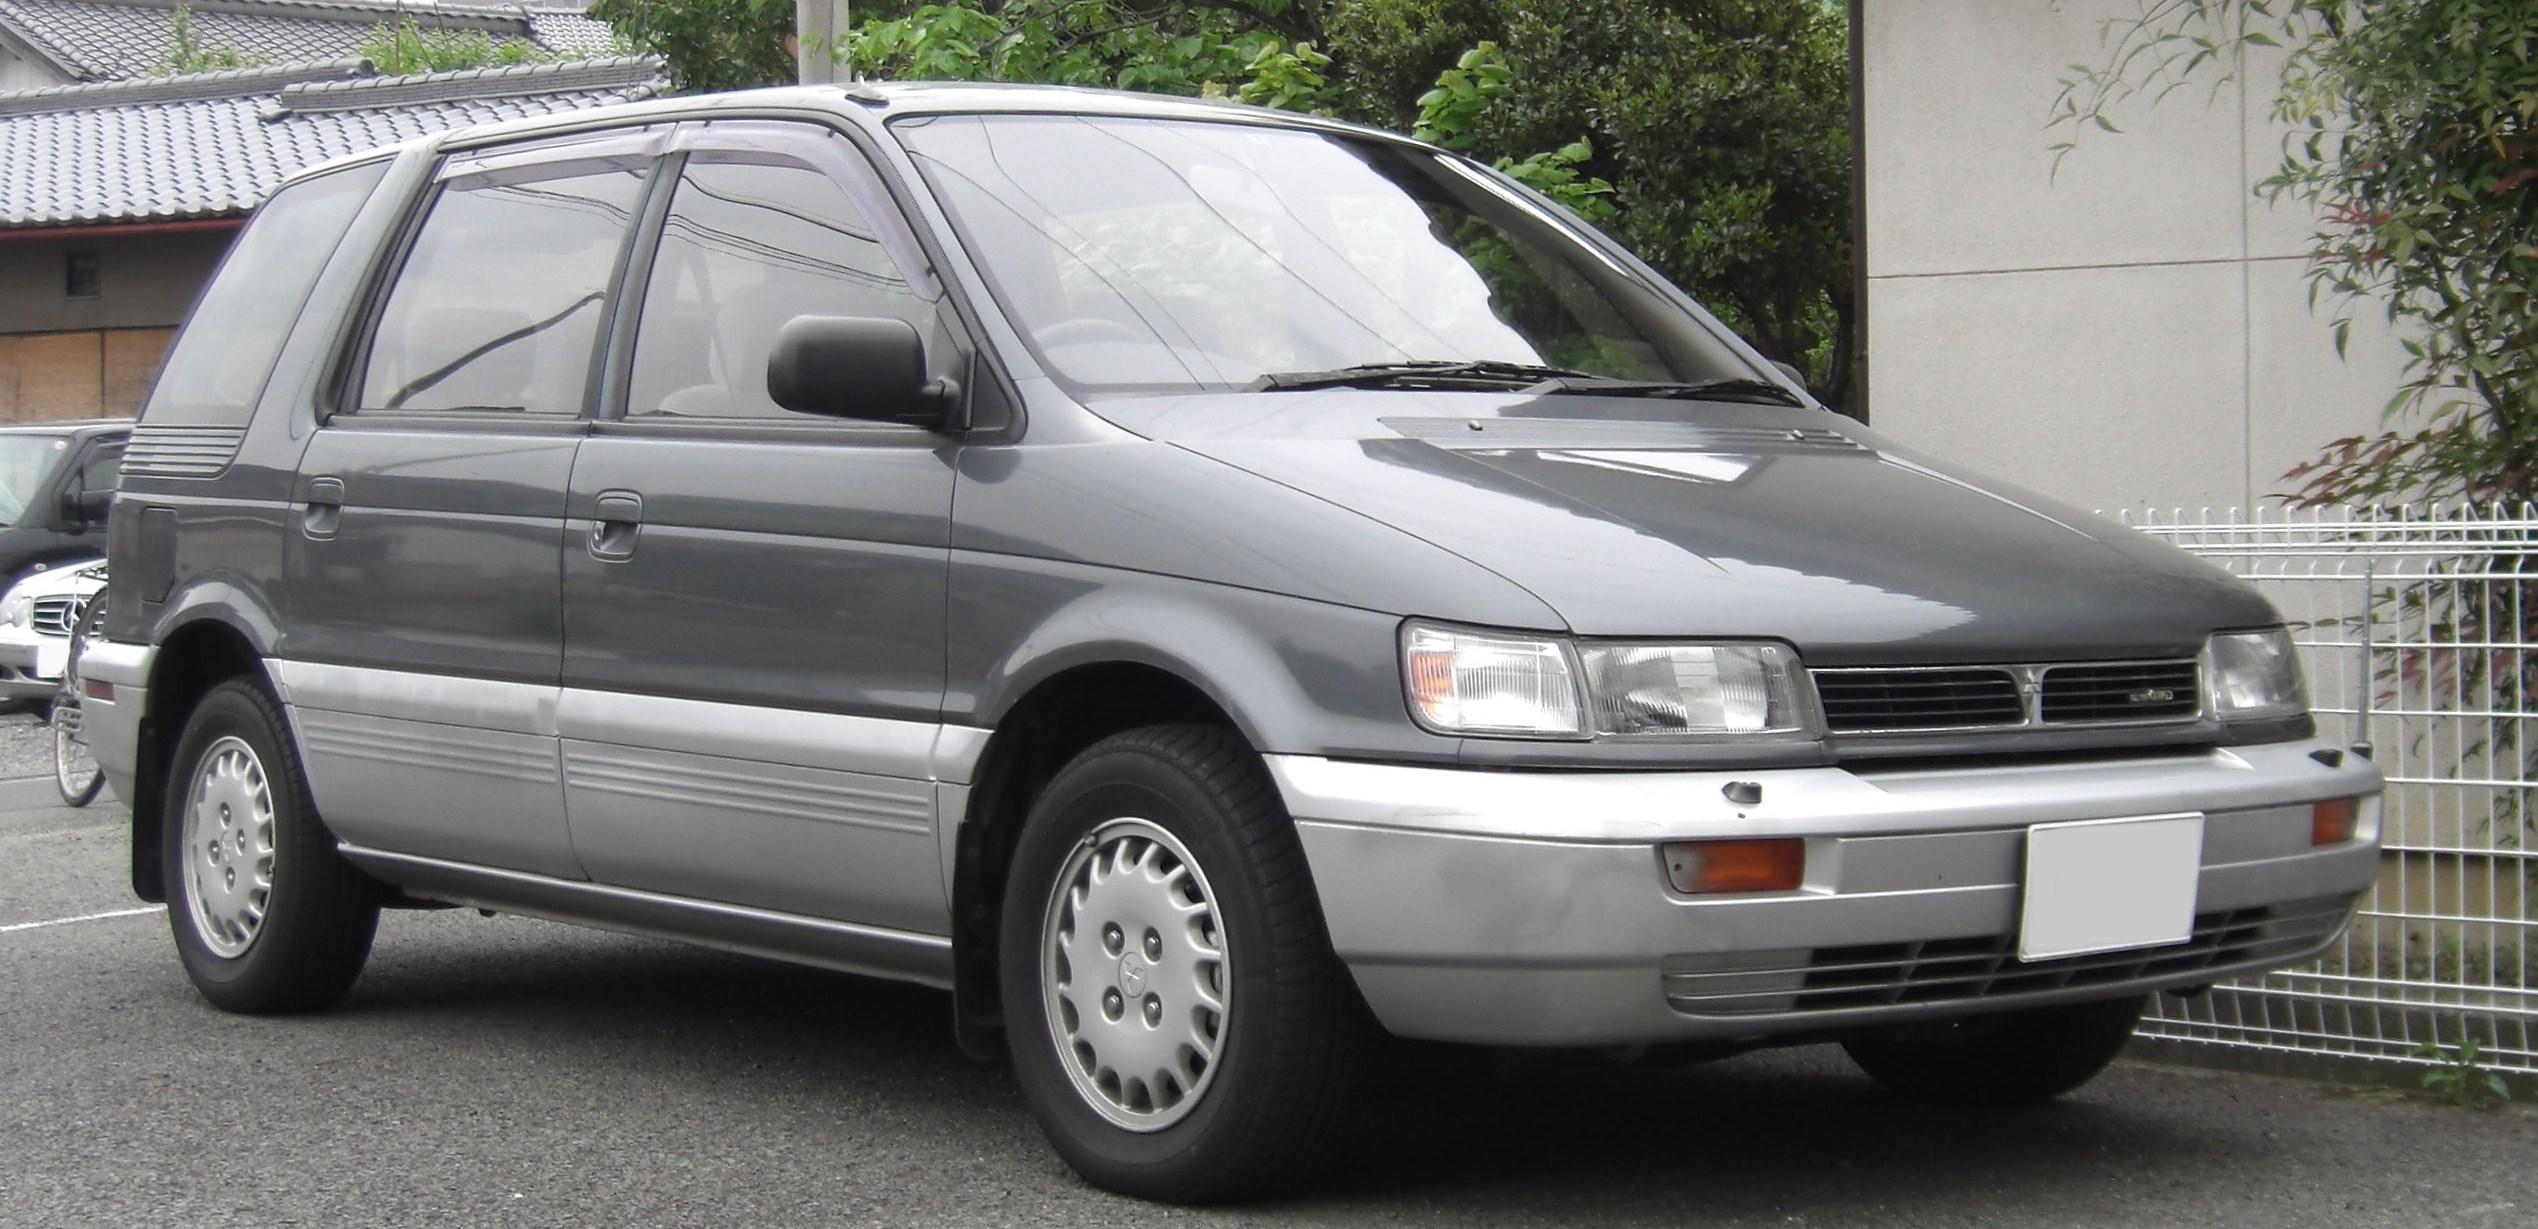 Mitsubishi Chariot I 1983 - 1991 Compact MPV #6